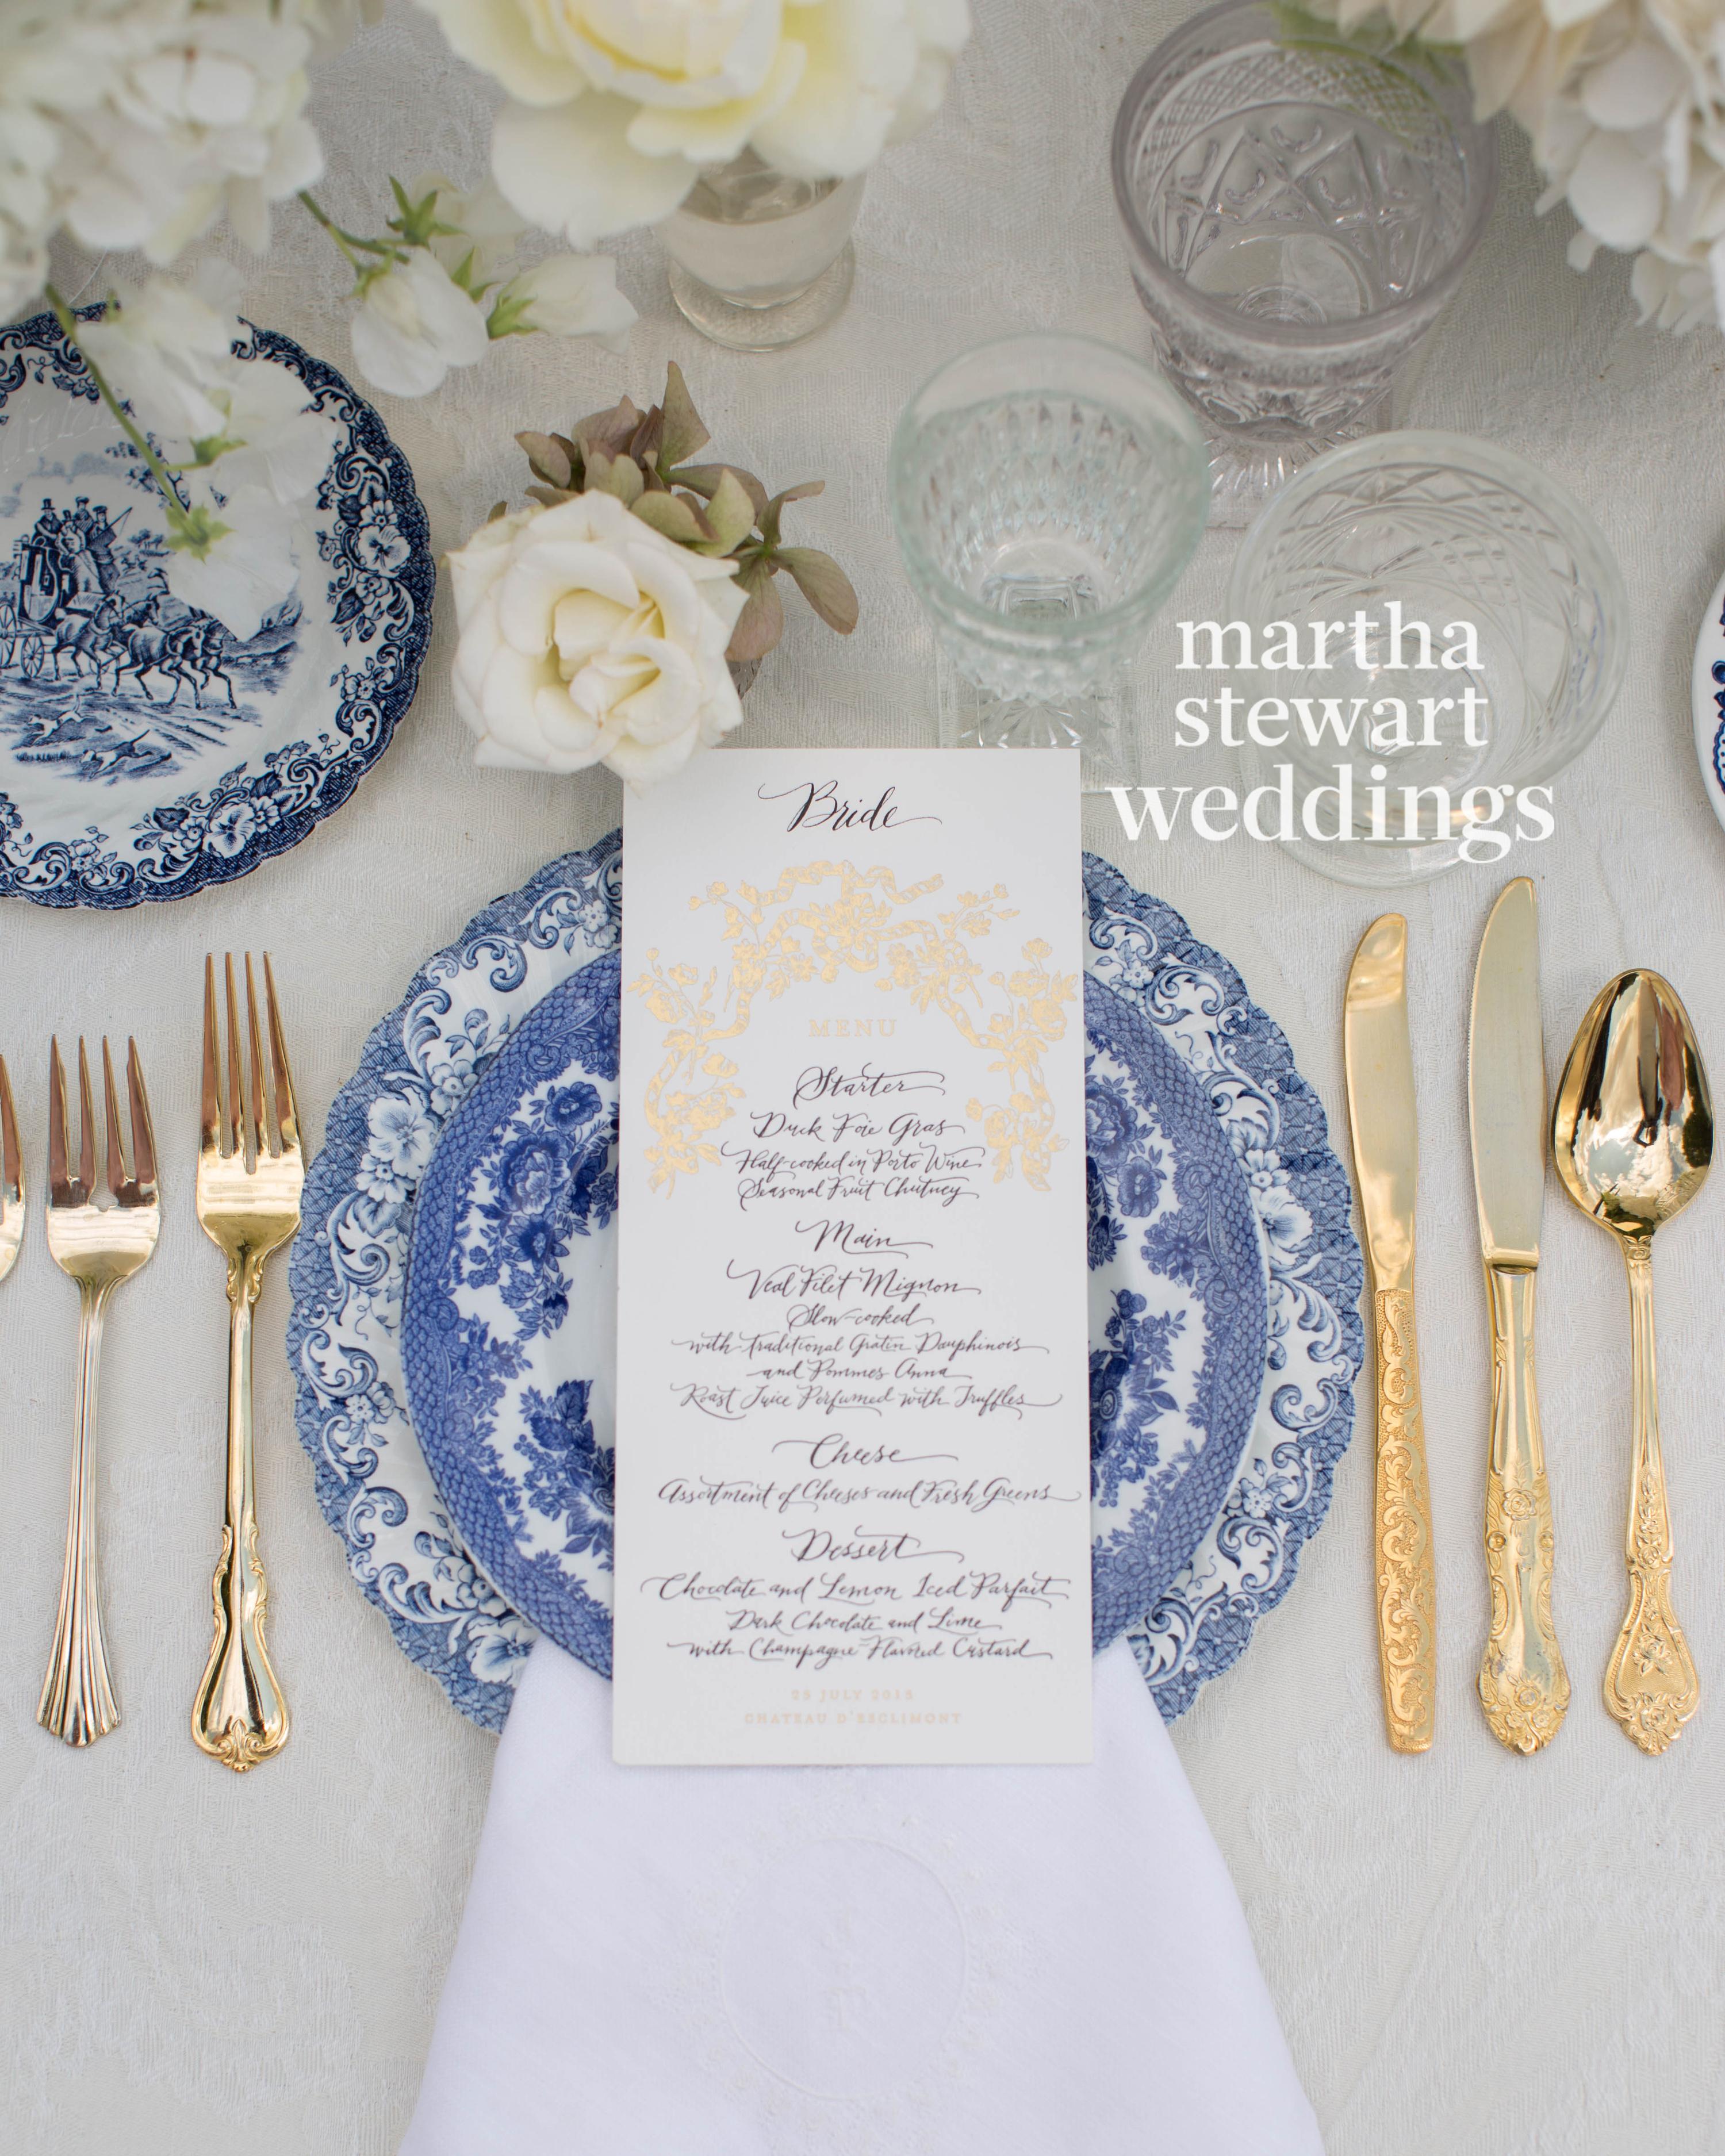 jenny-freddie-wedding-france-182-d112242-watermarked-1215.jpg